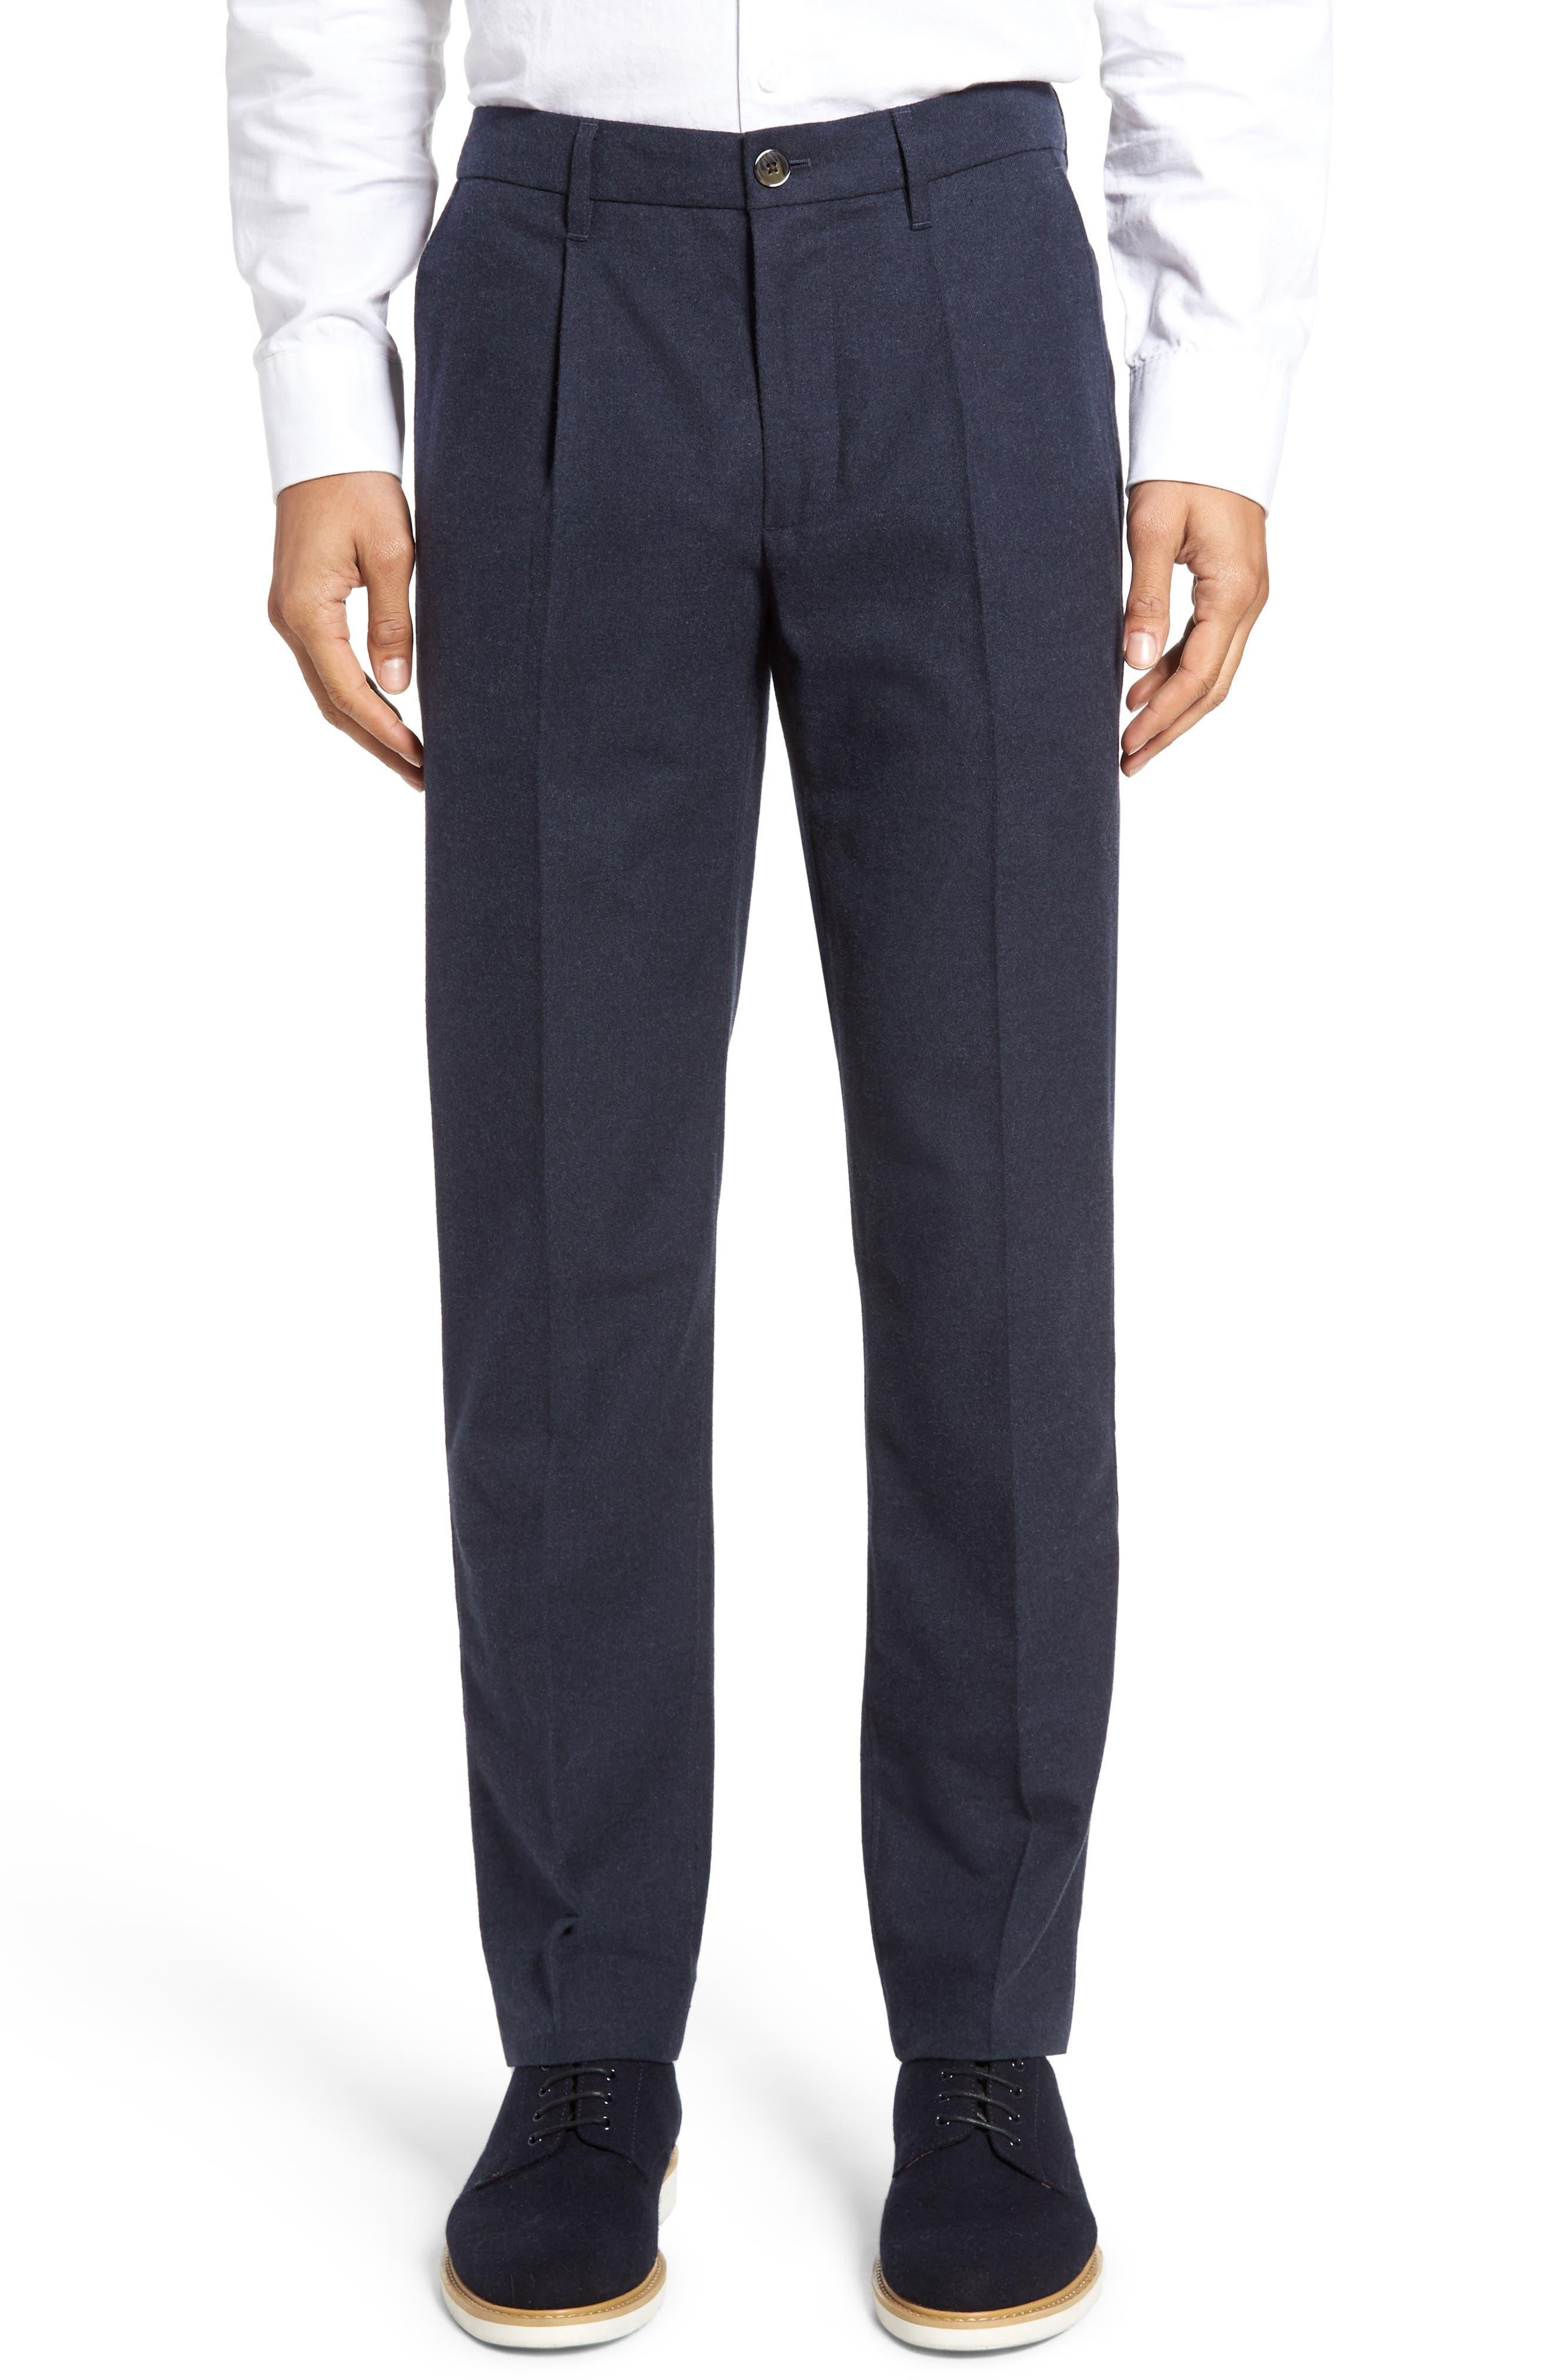 BONOBOS,                             Slim Fit Flannel Trousers,                             Alternate thumbnail 2, color,                             400